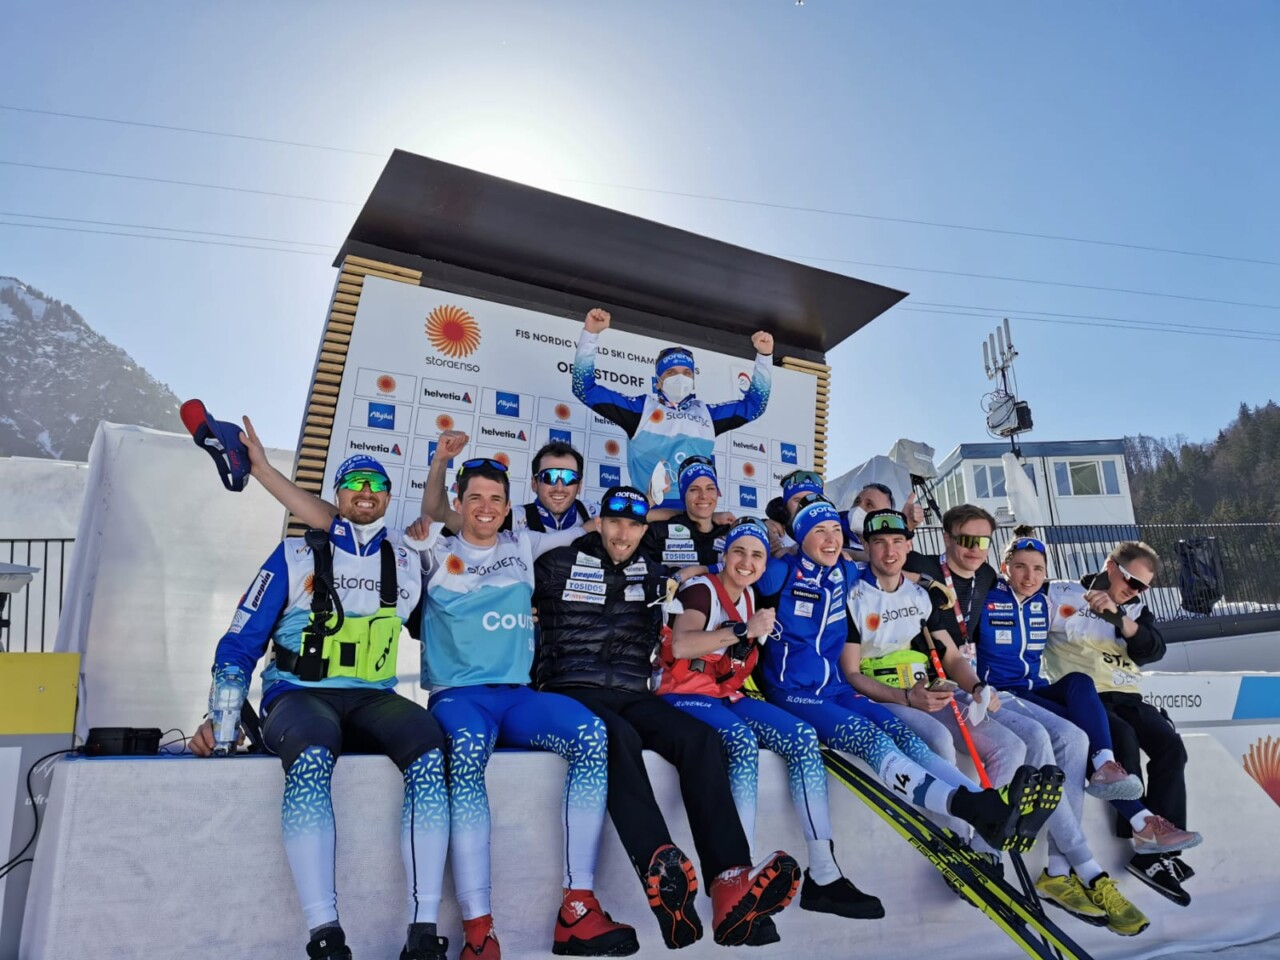 bron-sp2-vir-sloski-nordic-team-1280x960.jpg